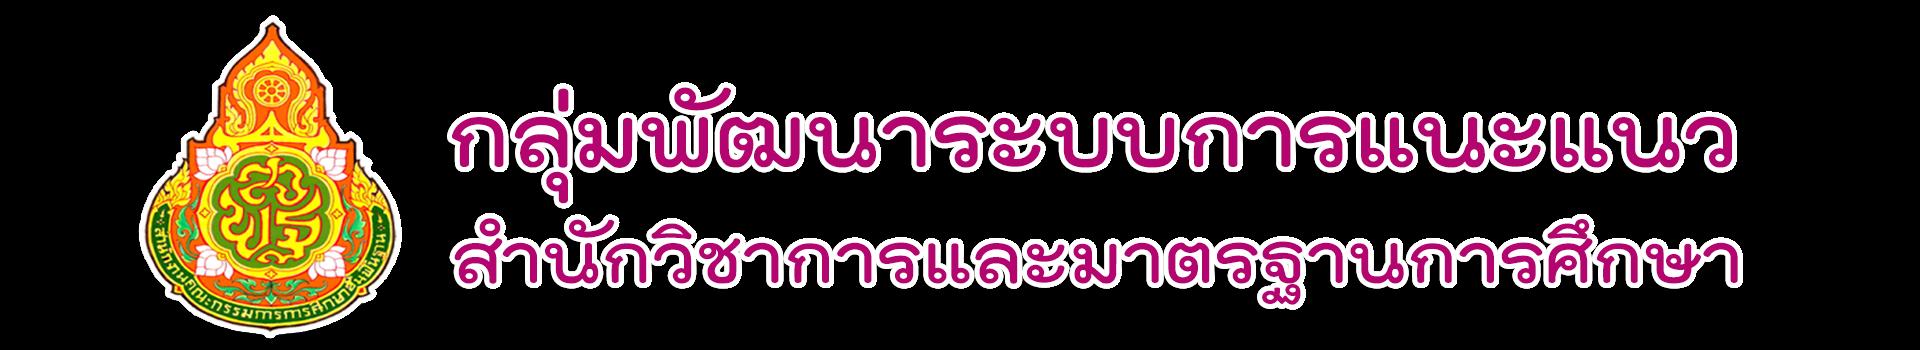 http://www.xn--h3crau8bs3b0jc.com/